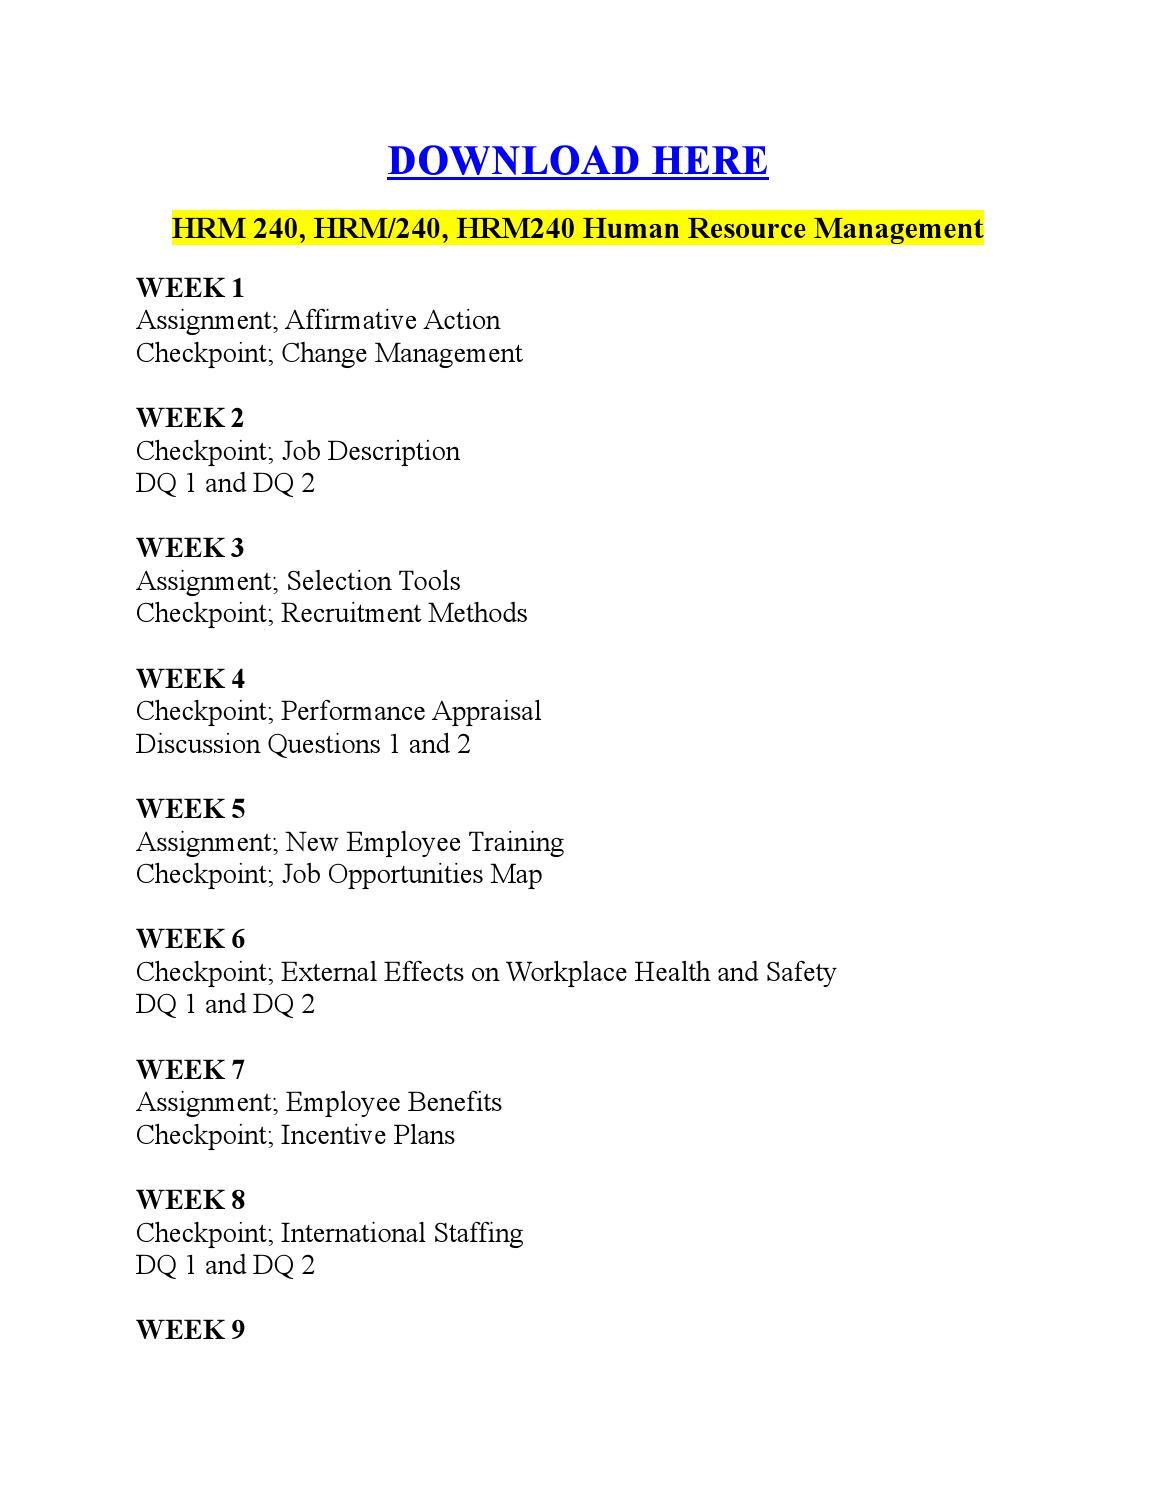 hrm 240 international staffing